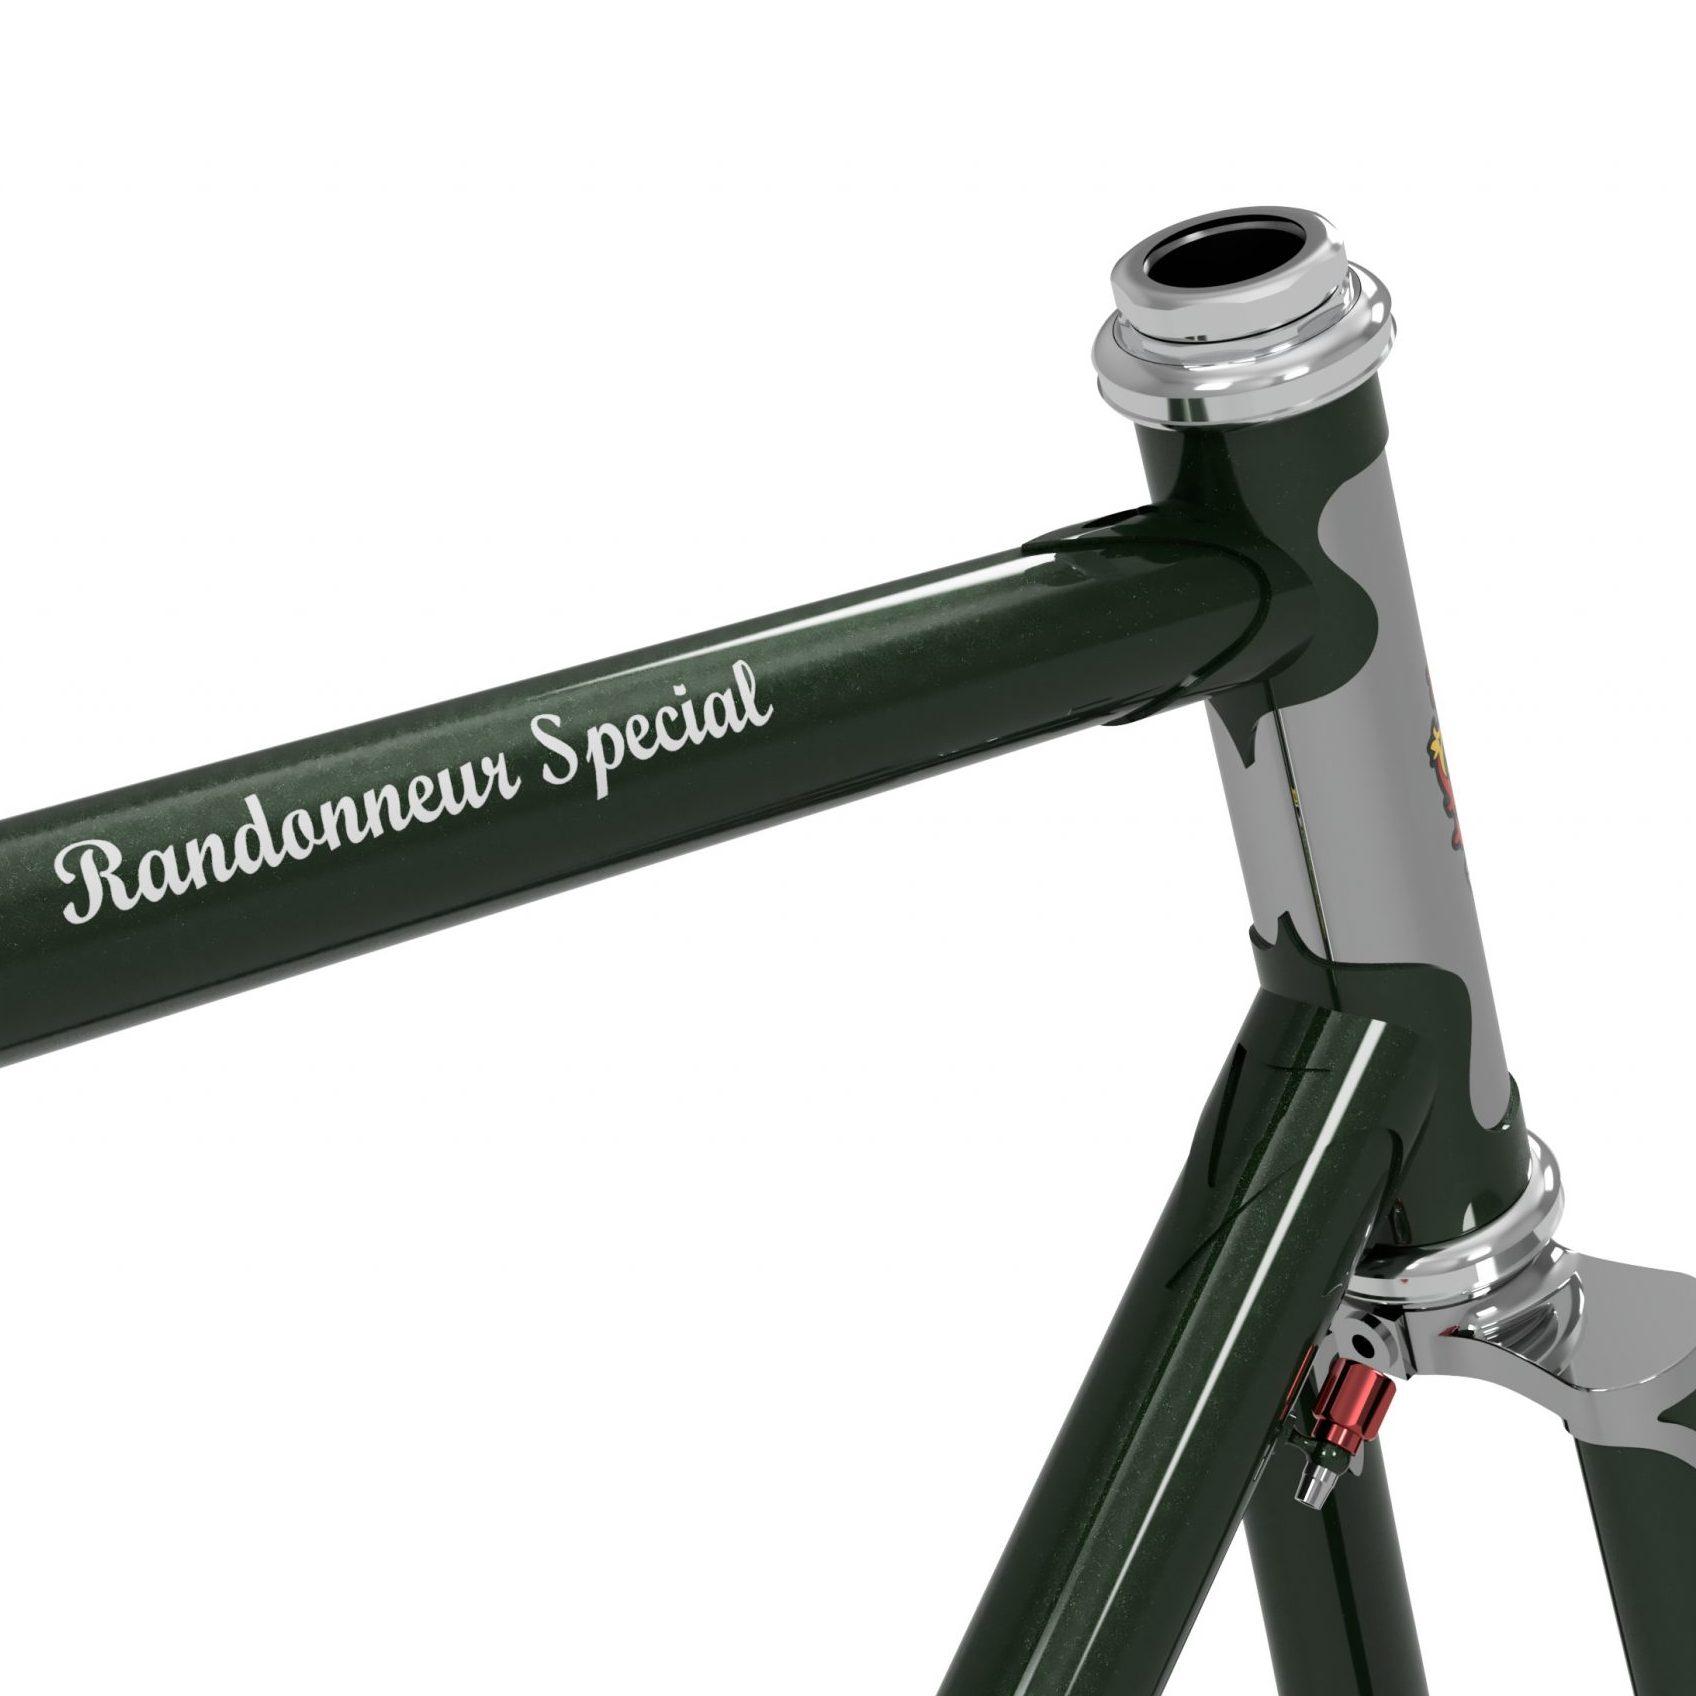 Randonneur Special